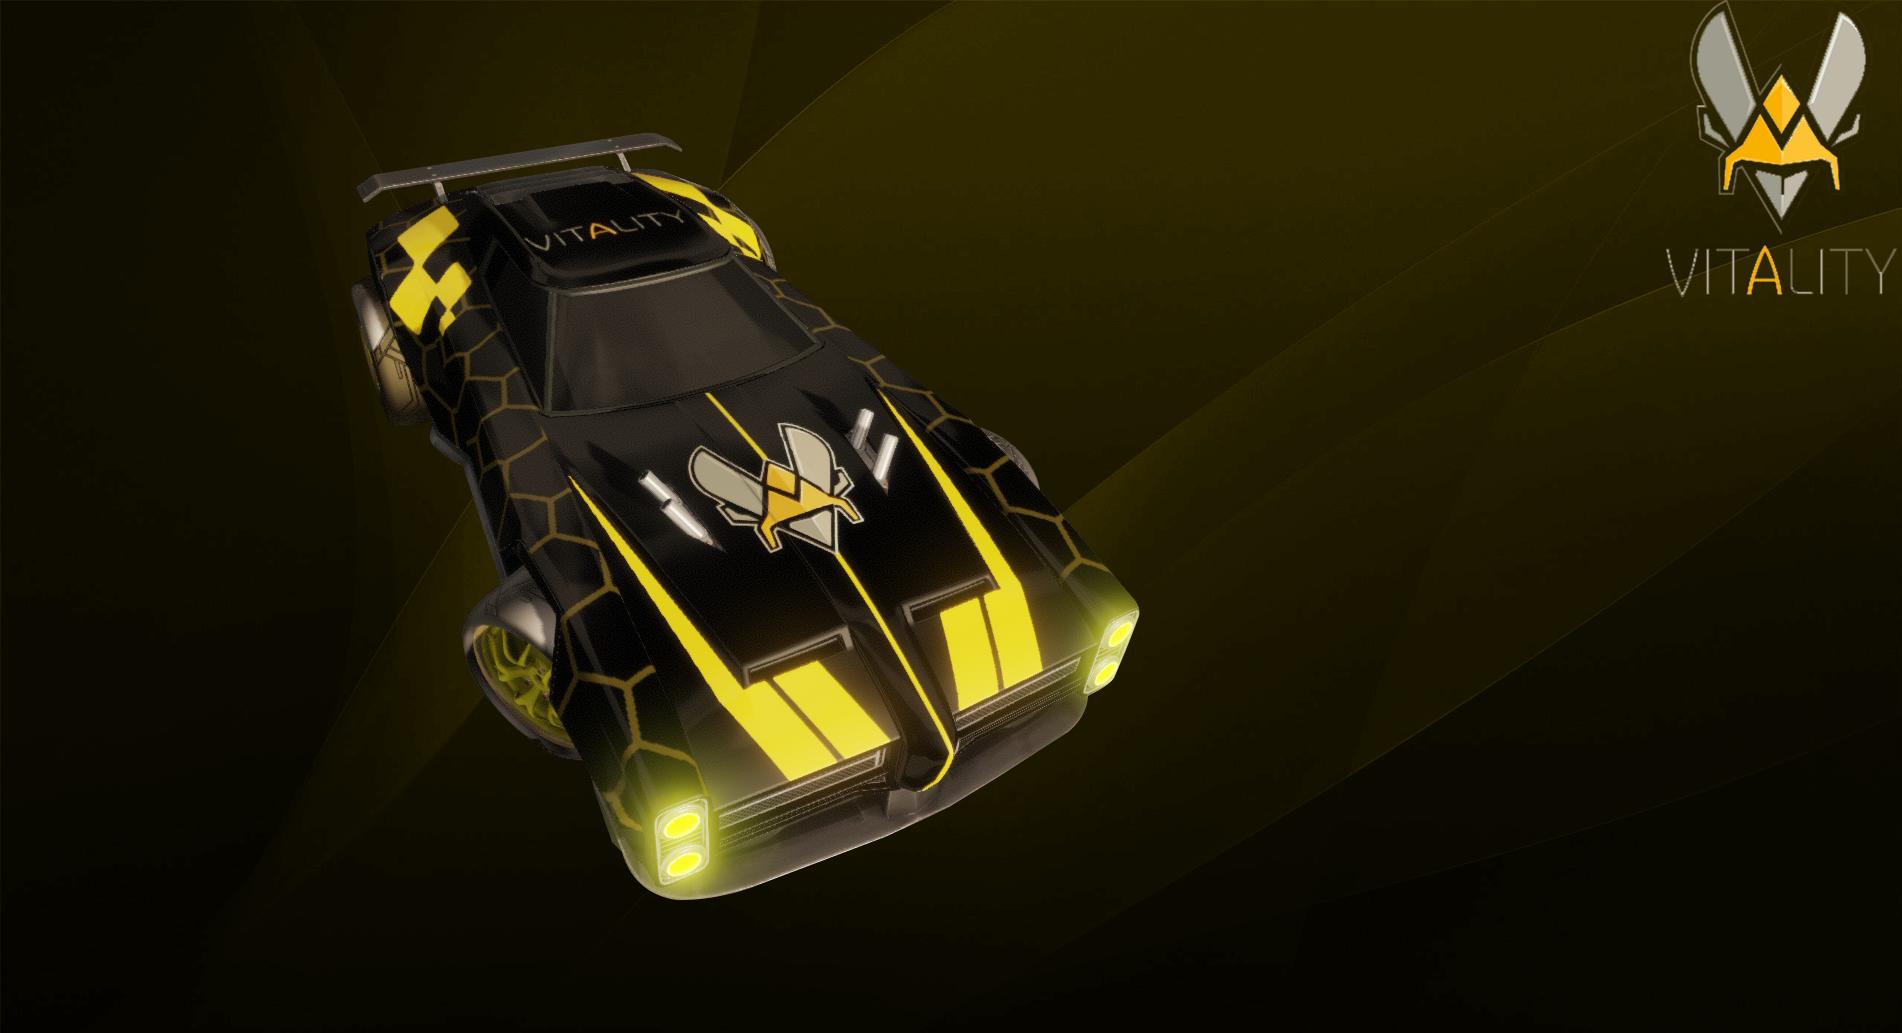 Renault Vitality Dominus Skin